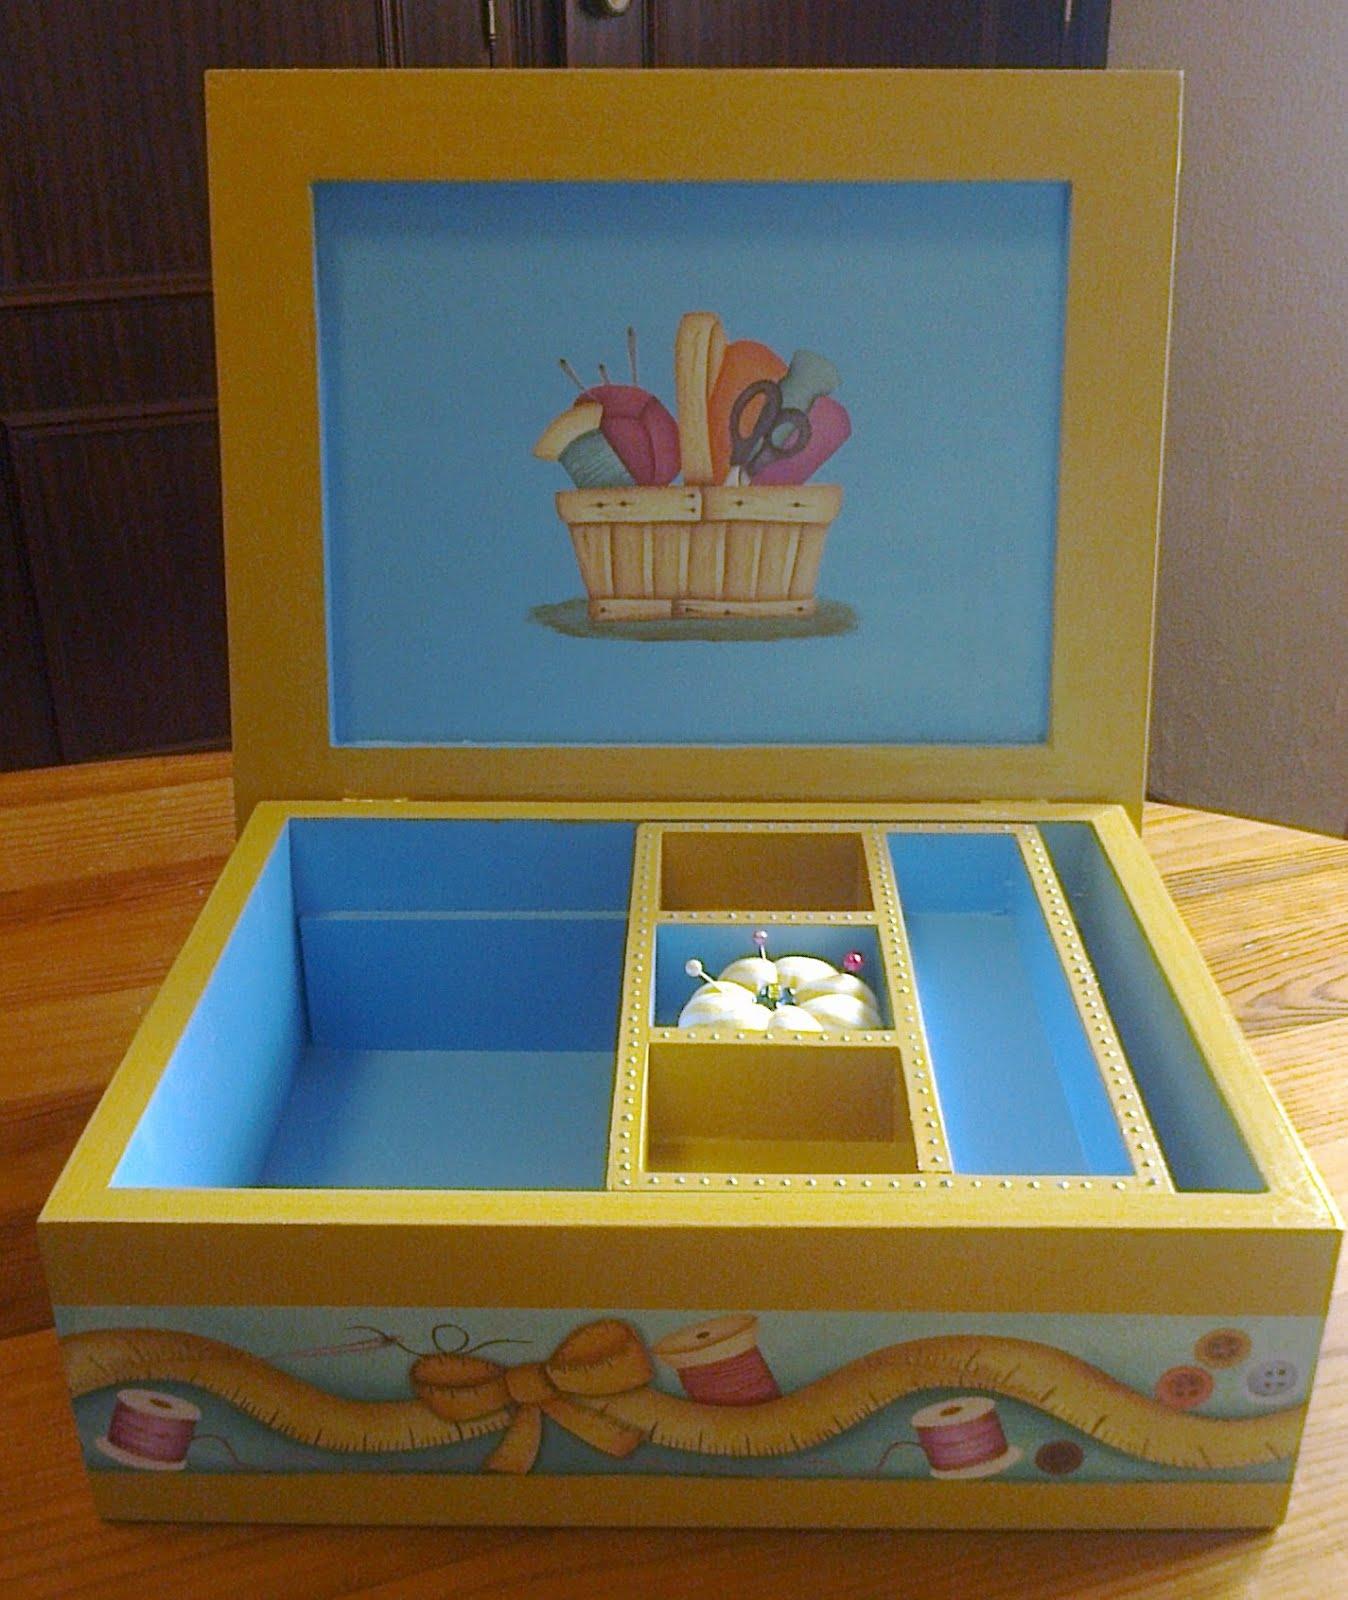 Interior da caixa